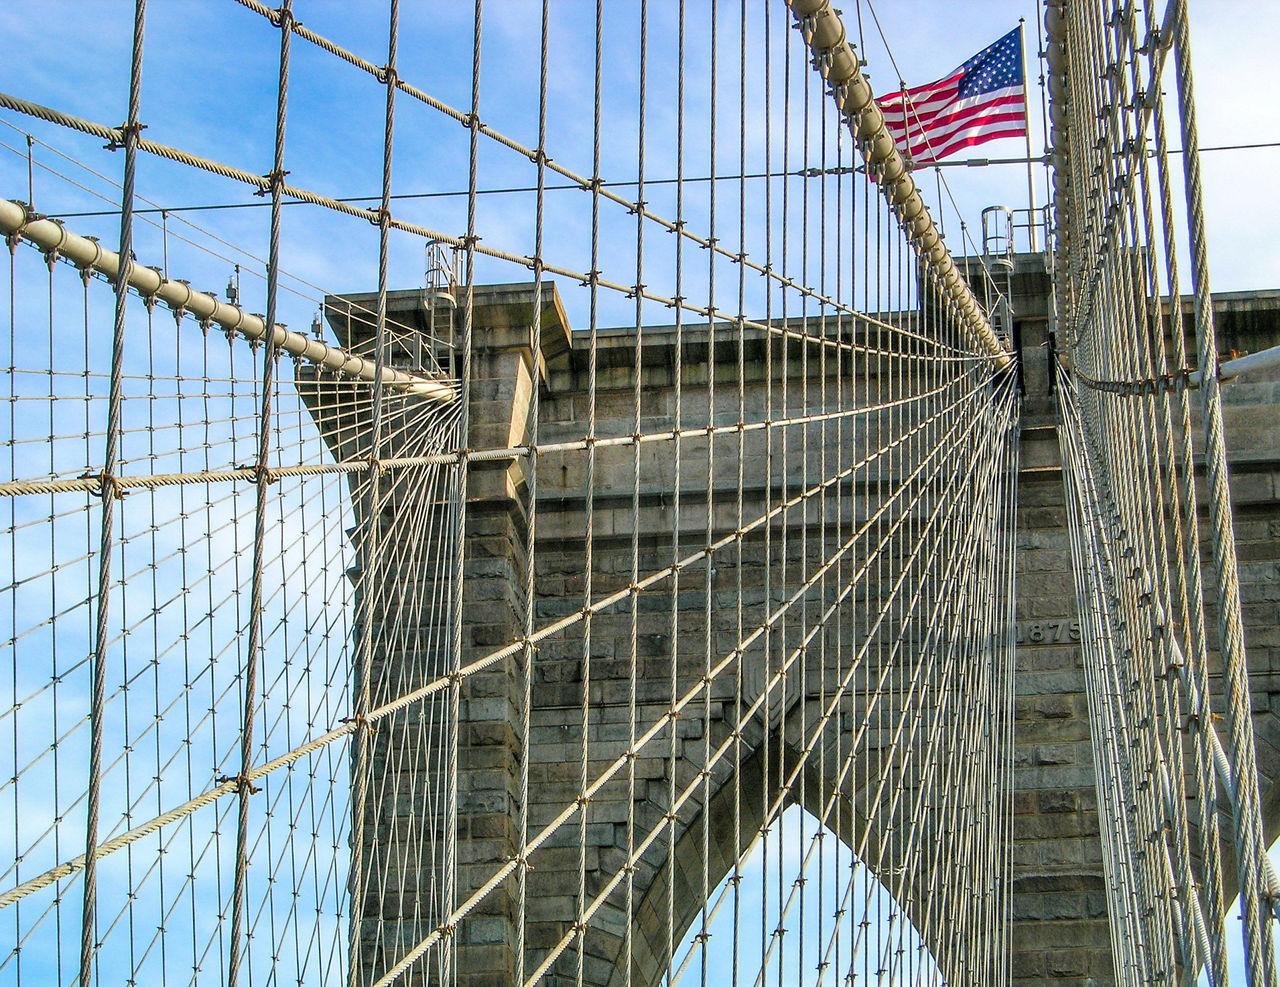 Low Angle View Of American Flag Waving On Brooklyn Bridge